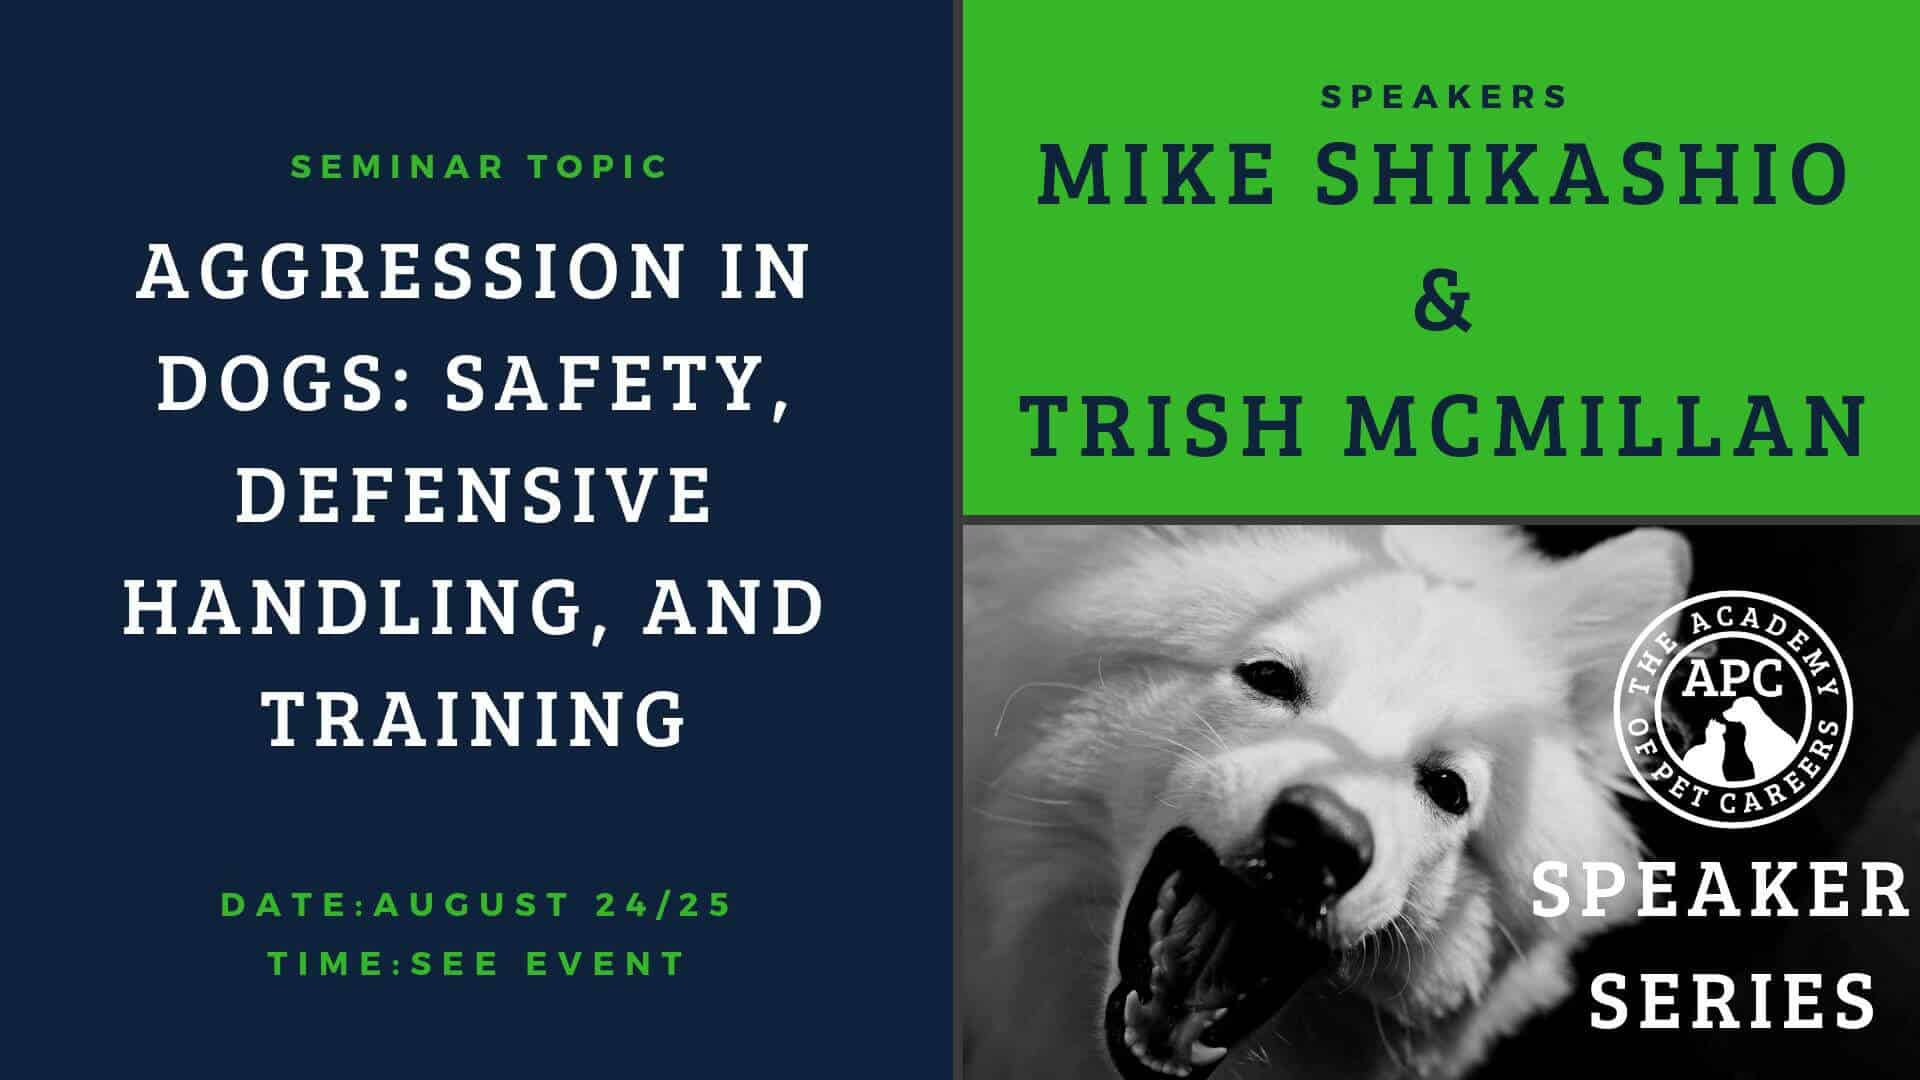 Mike Shikashio, Trish McMillan, The Academy of Pet Careers